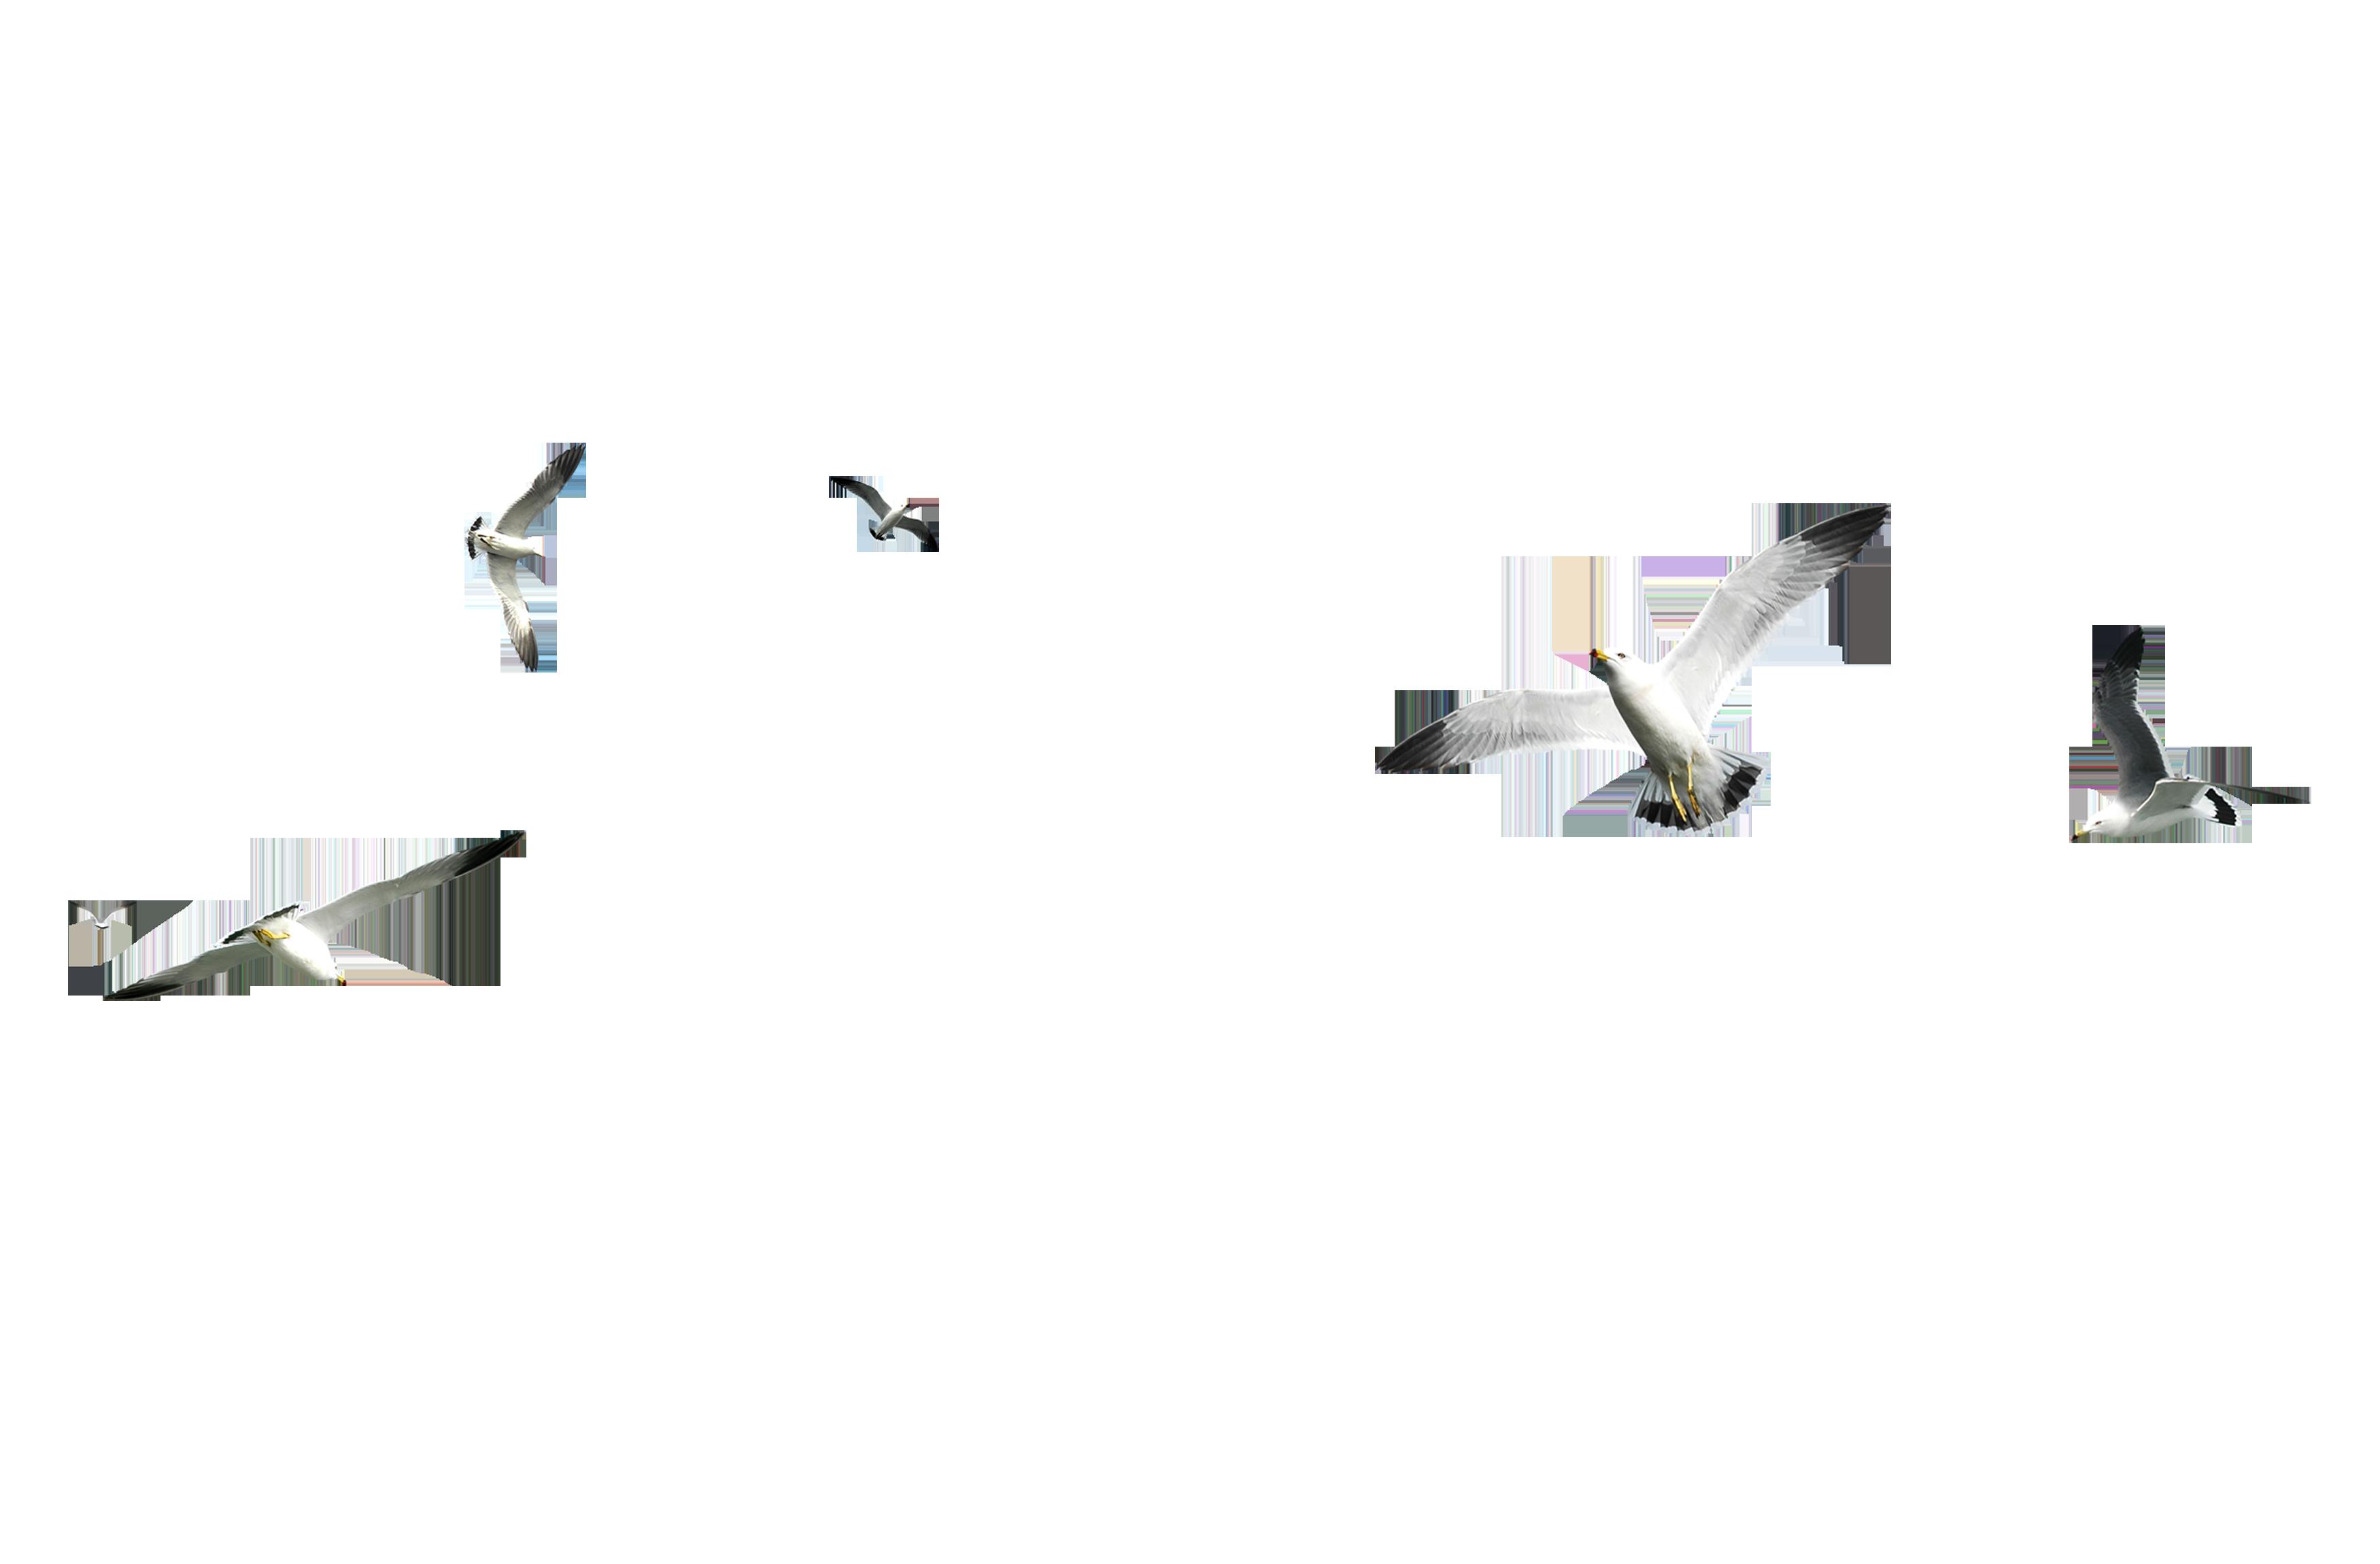 Клипарт анимация на прозрачном фоне чайки летят